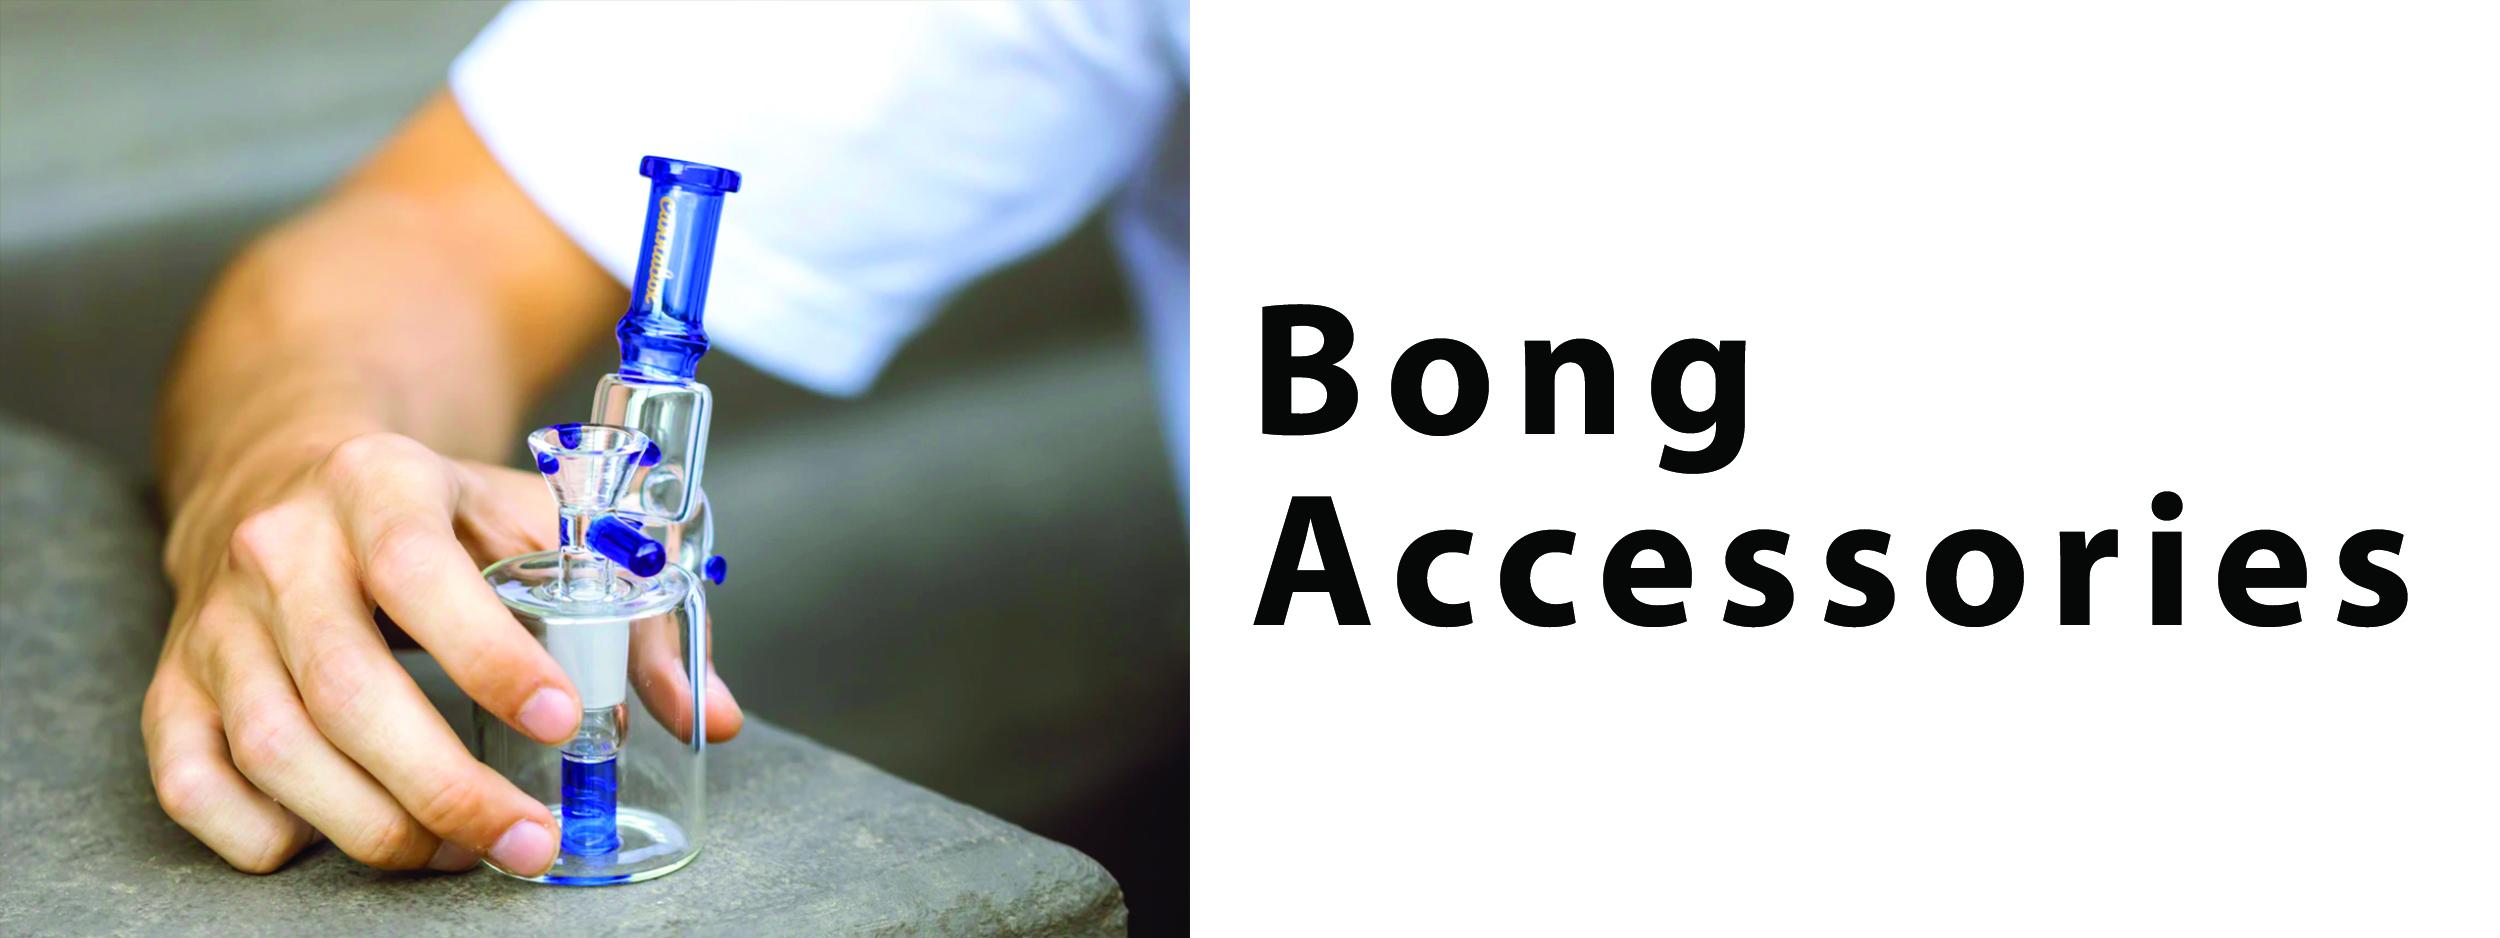 BONG ACCESSORIES